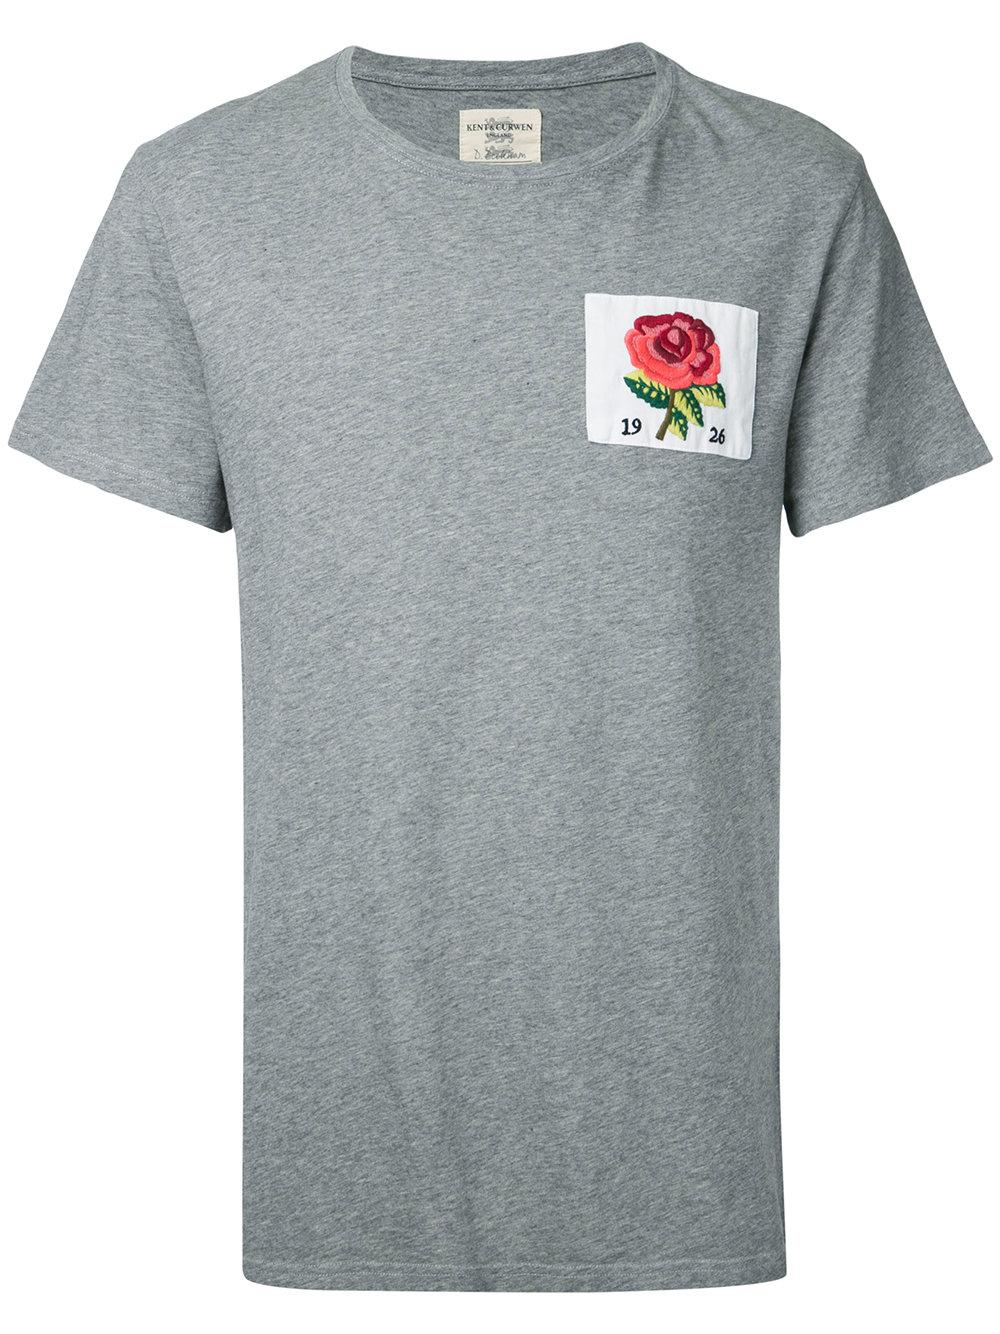 Kent curwen rose t shirt in grey for men lyst